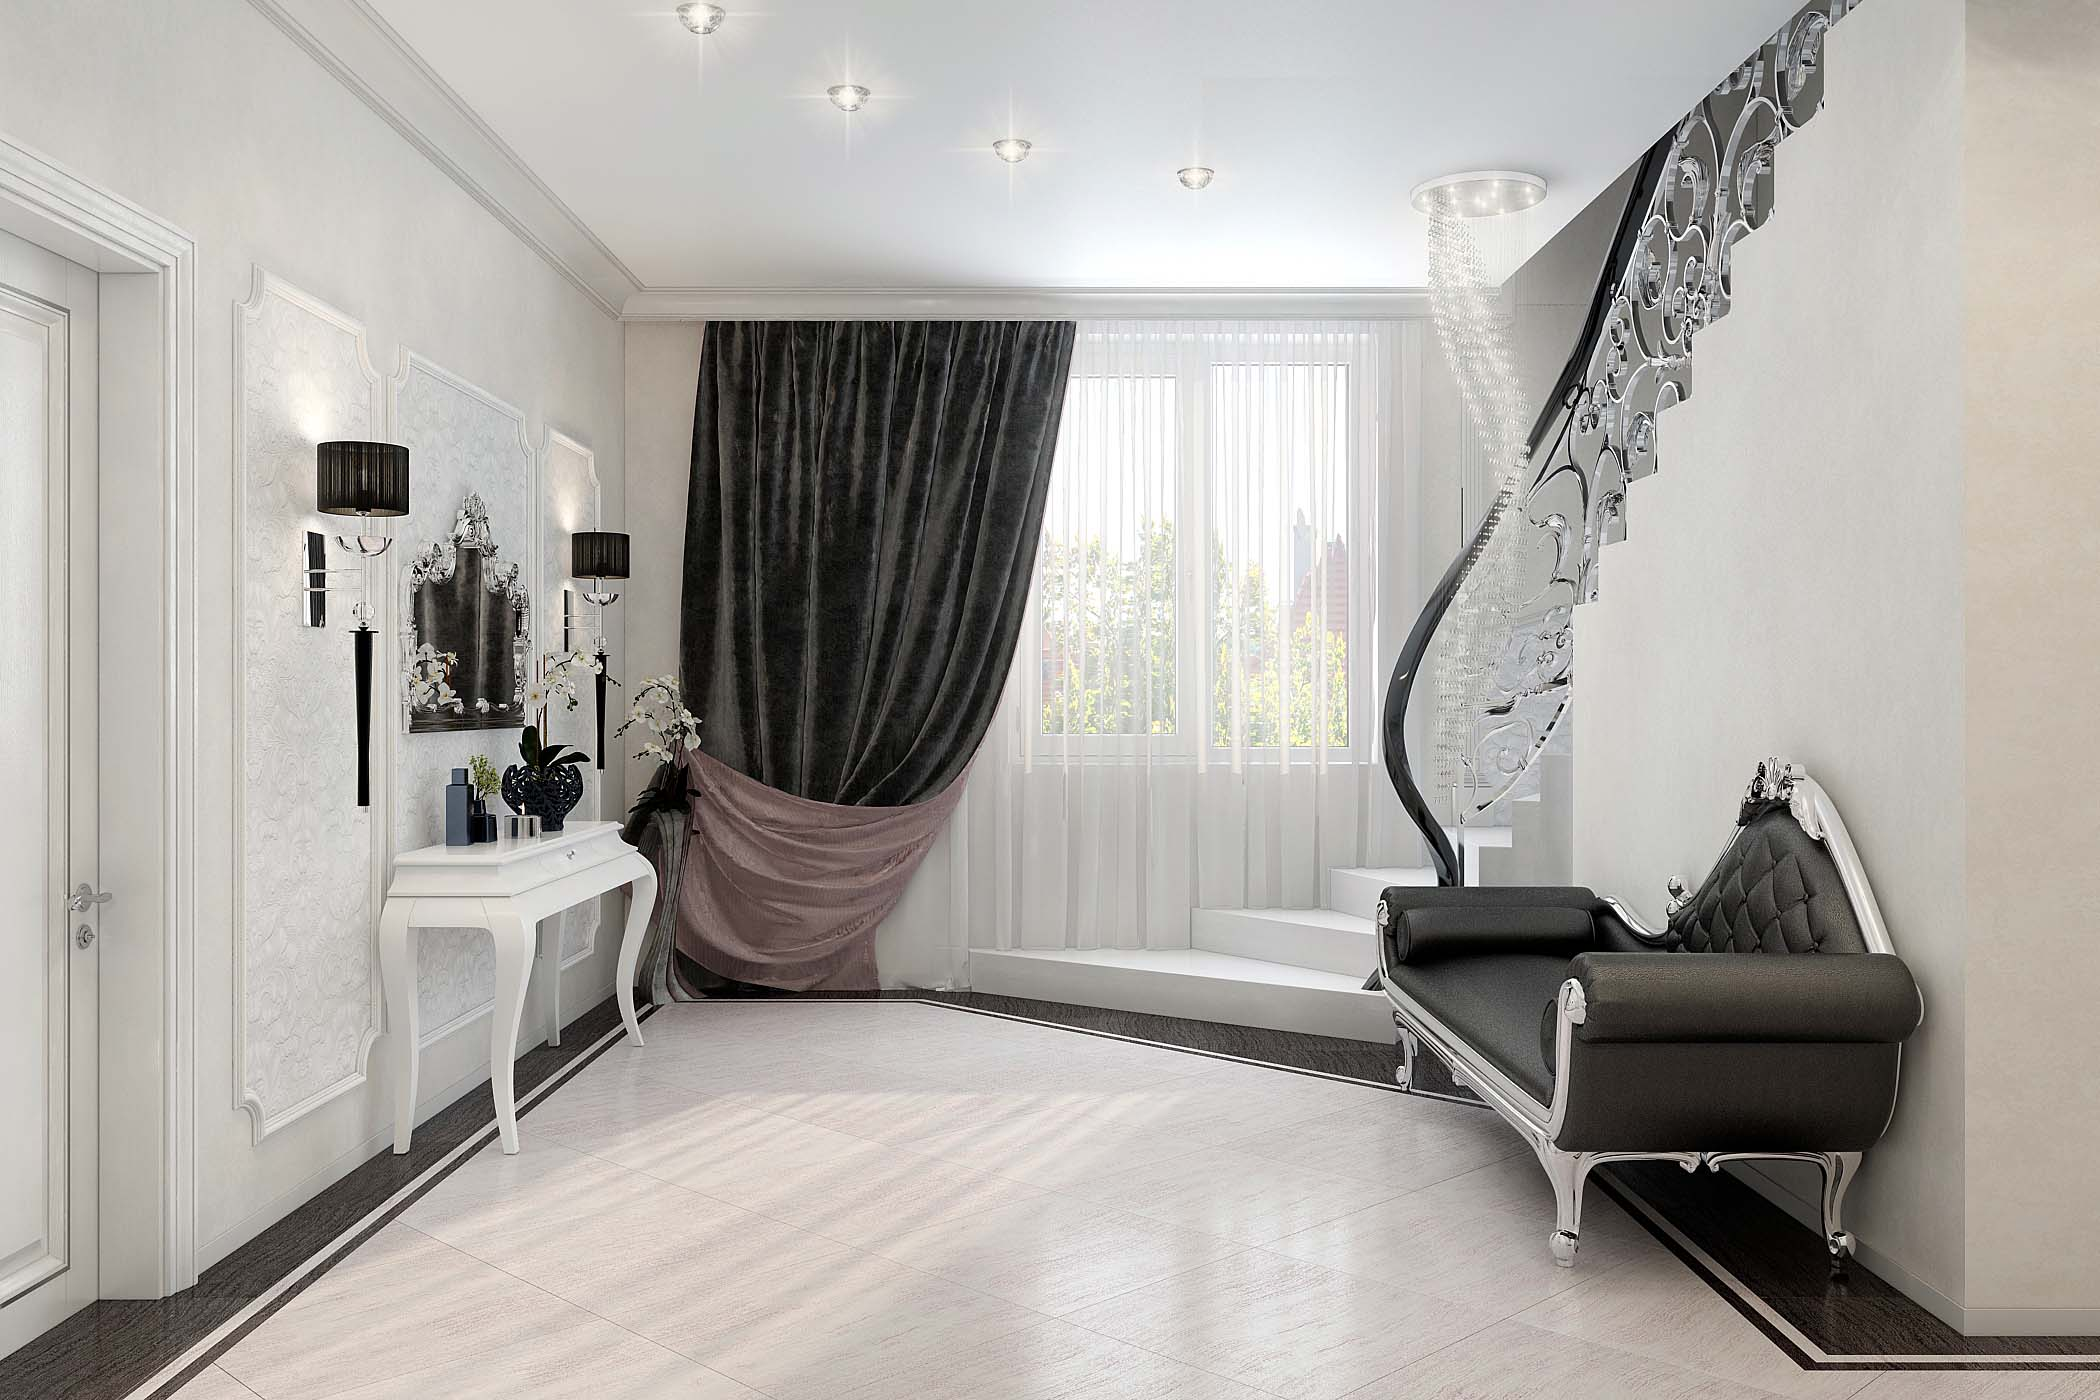 Дизайн интерьера холла 1 этажа